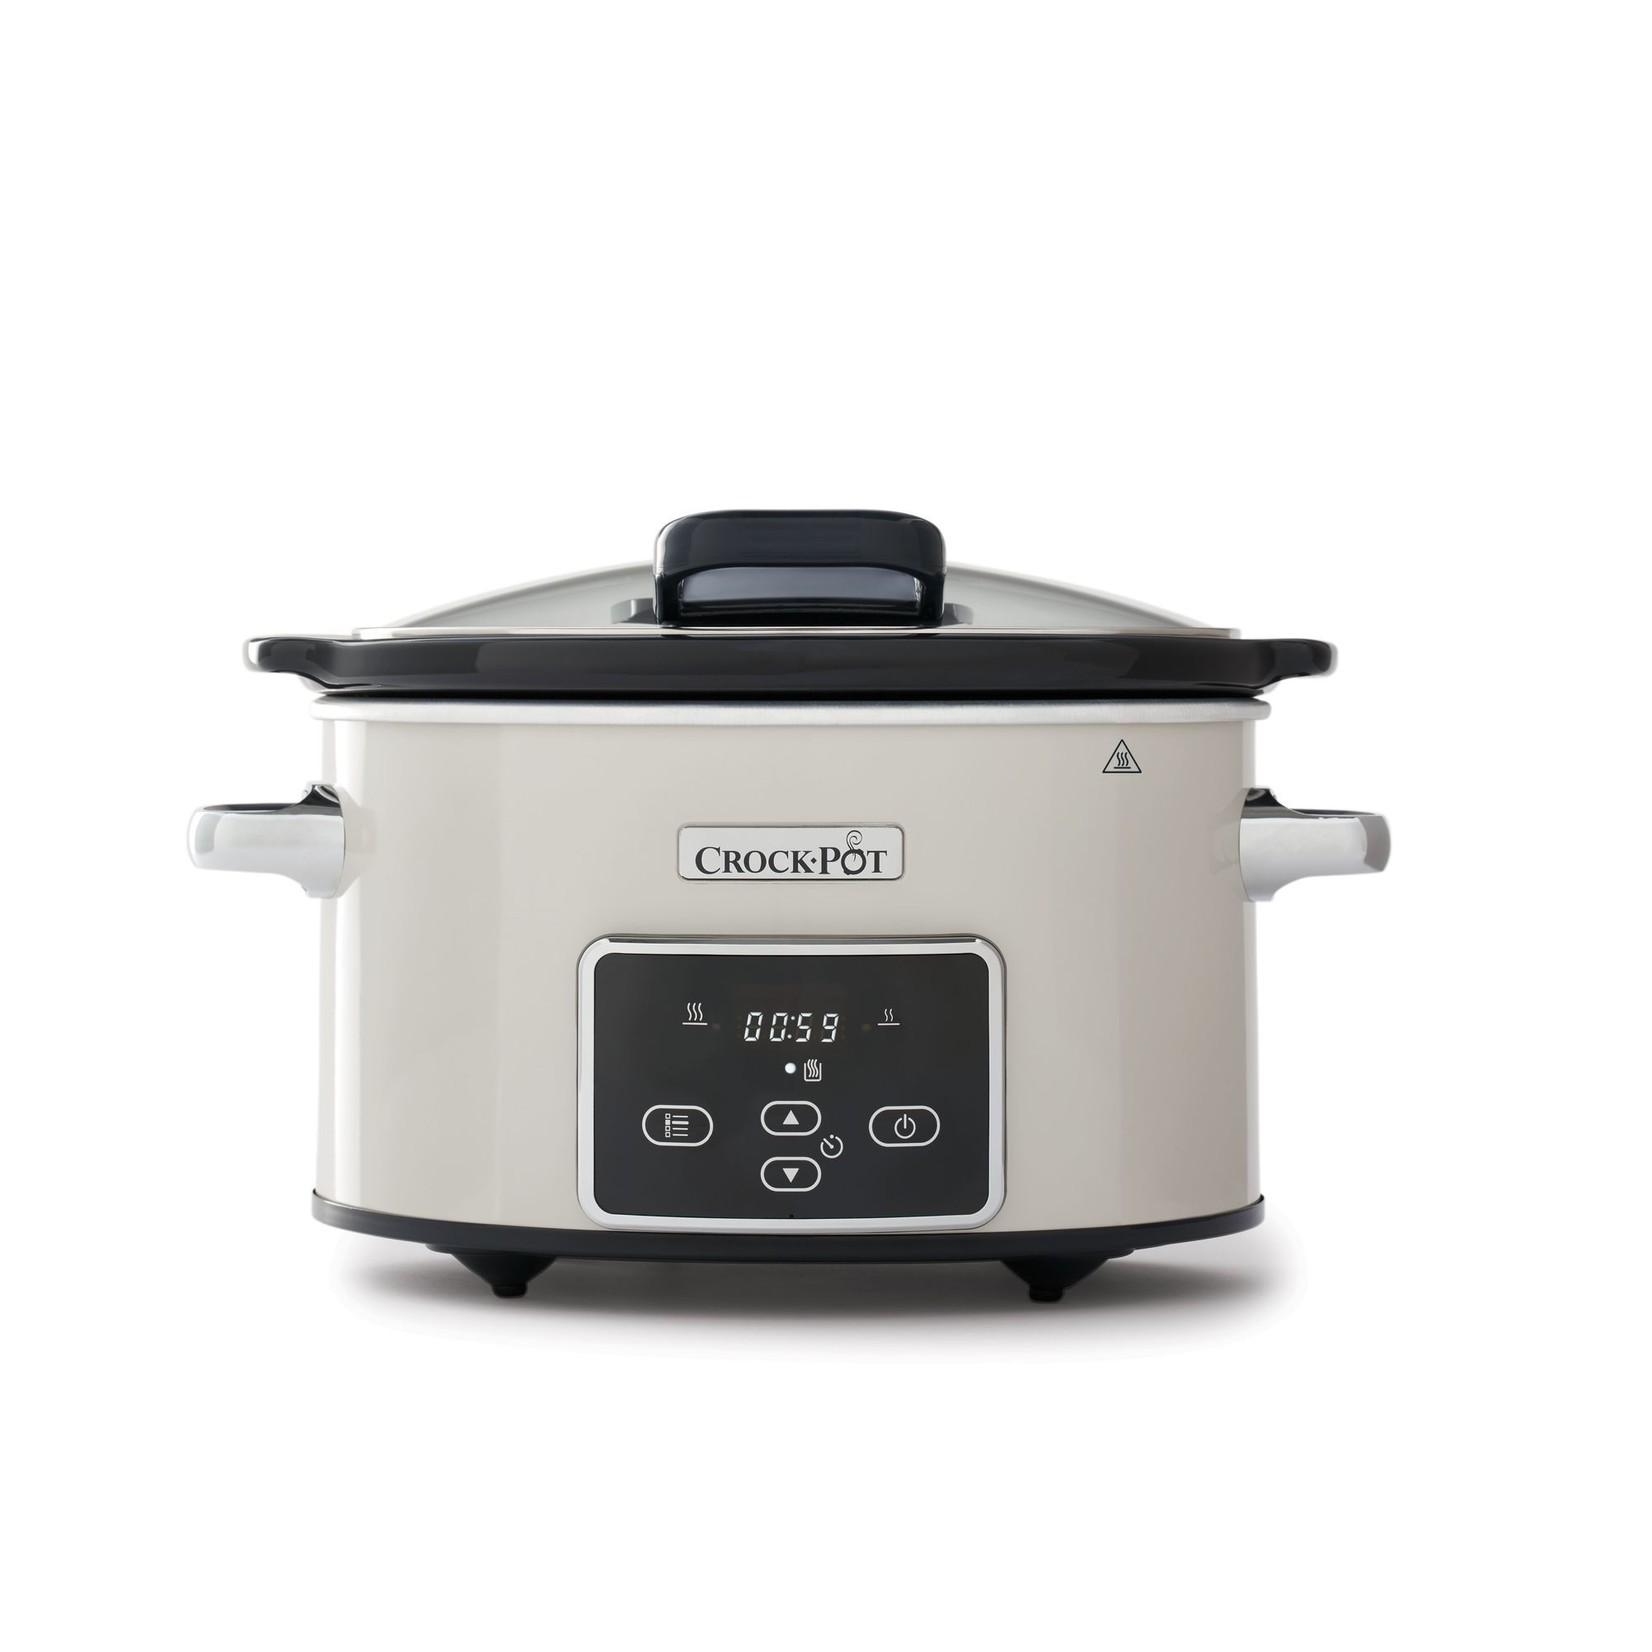 Crock-Pot Crock-Pot slowcooker Beigewit 3,5L Klapdeksel Digitaal